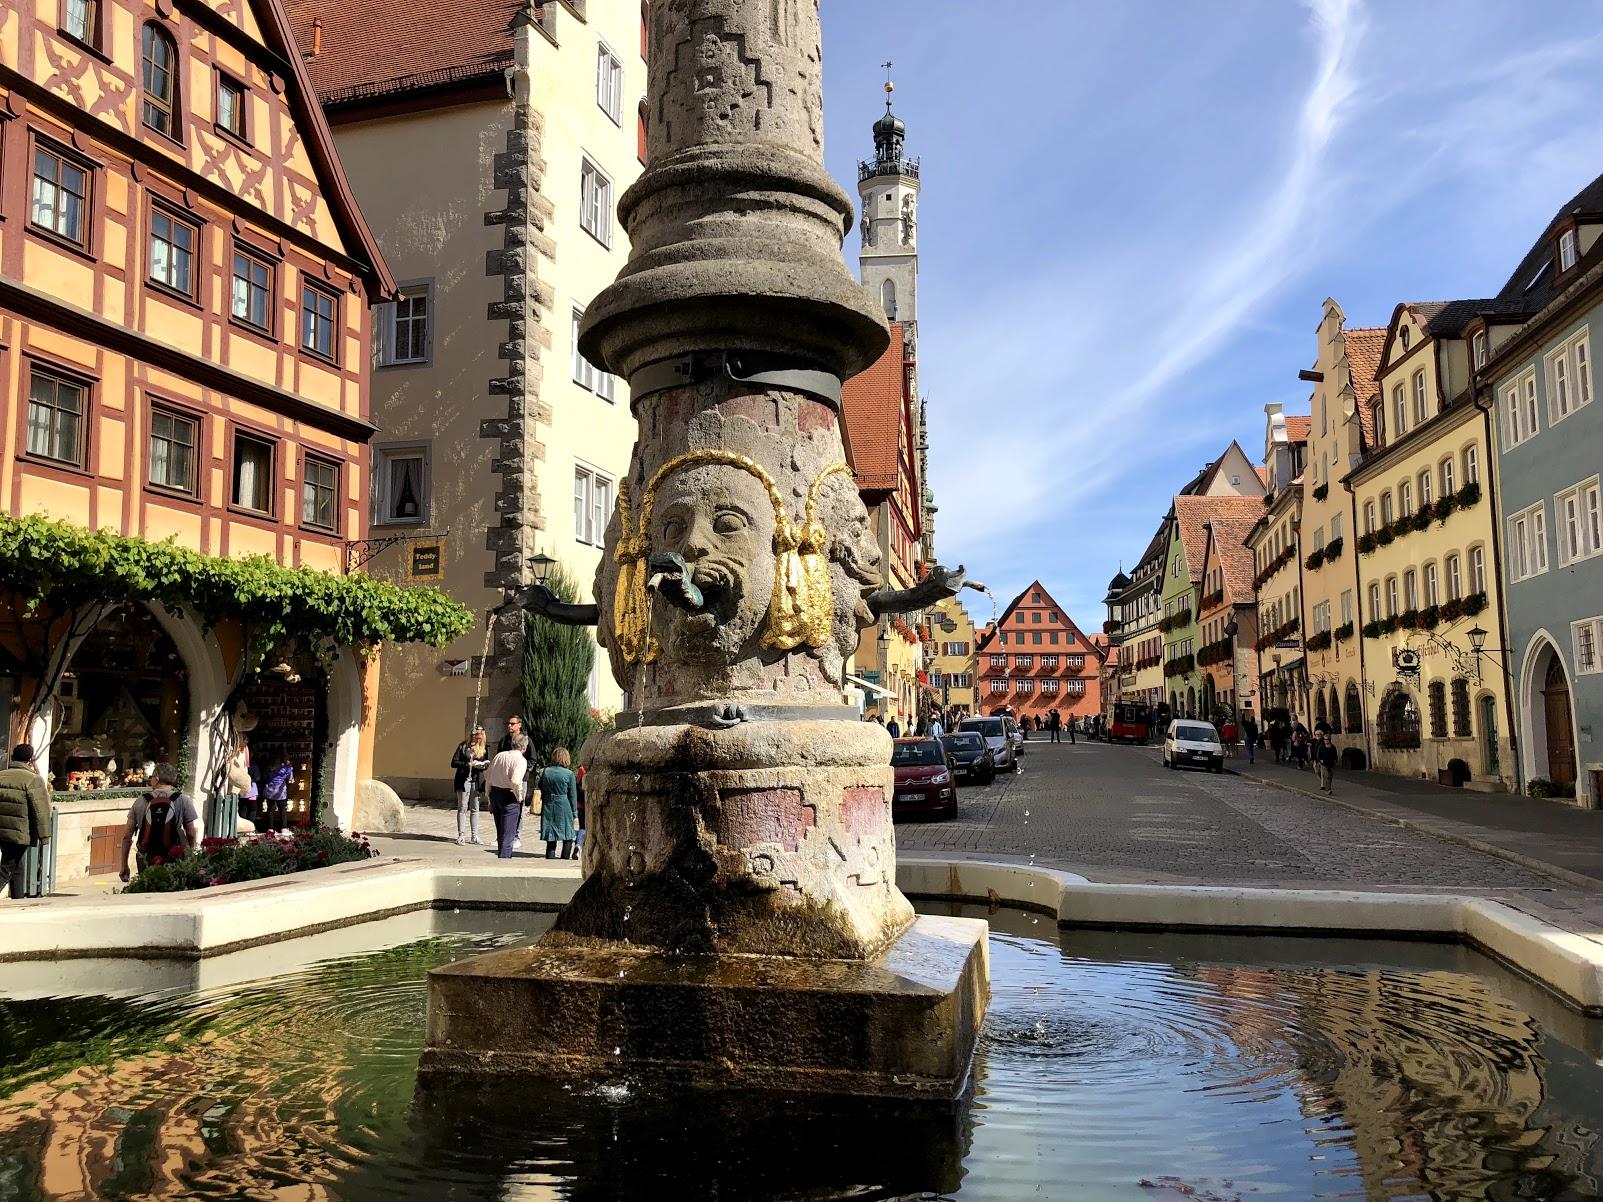 Rothenburg ob der Tauber, Germany fountain